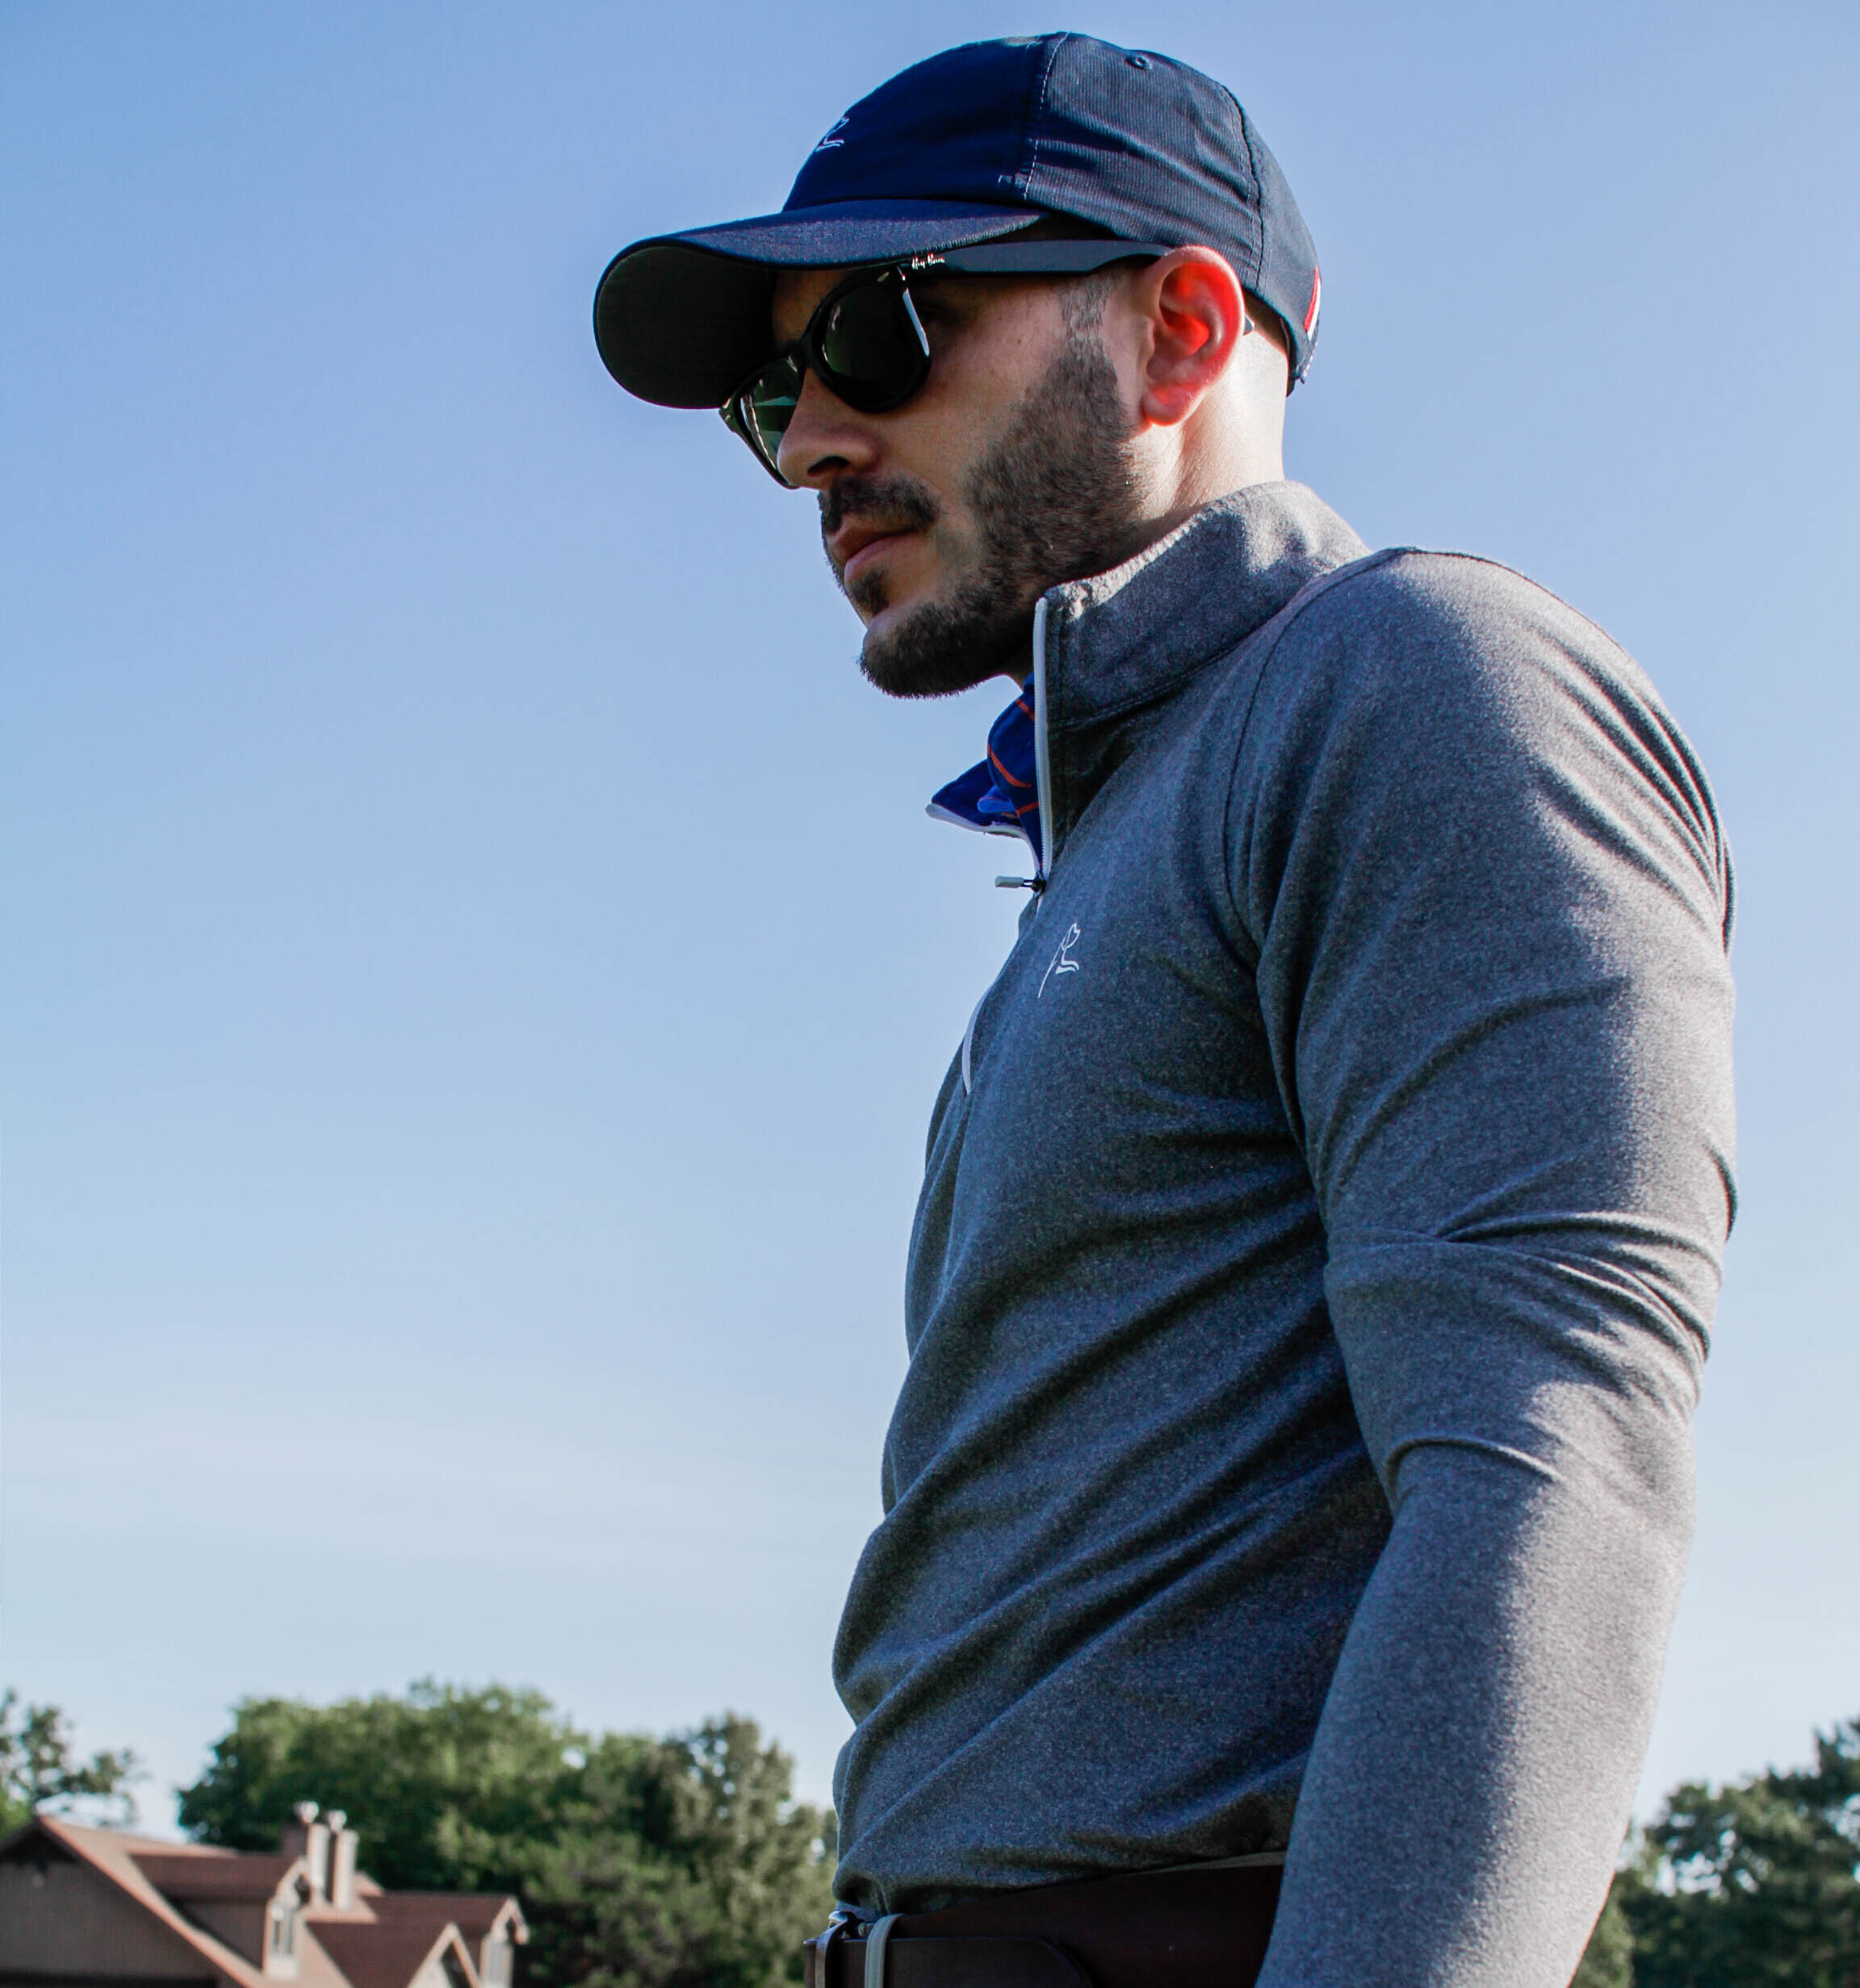 Men's Golf Apparel Online Brand Review